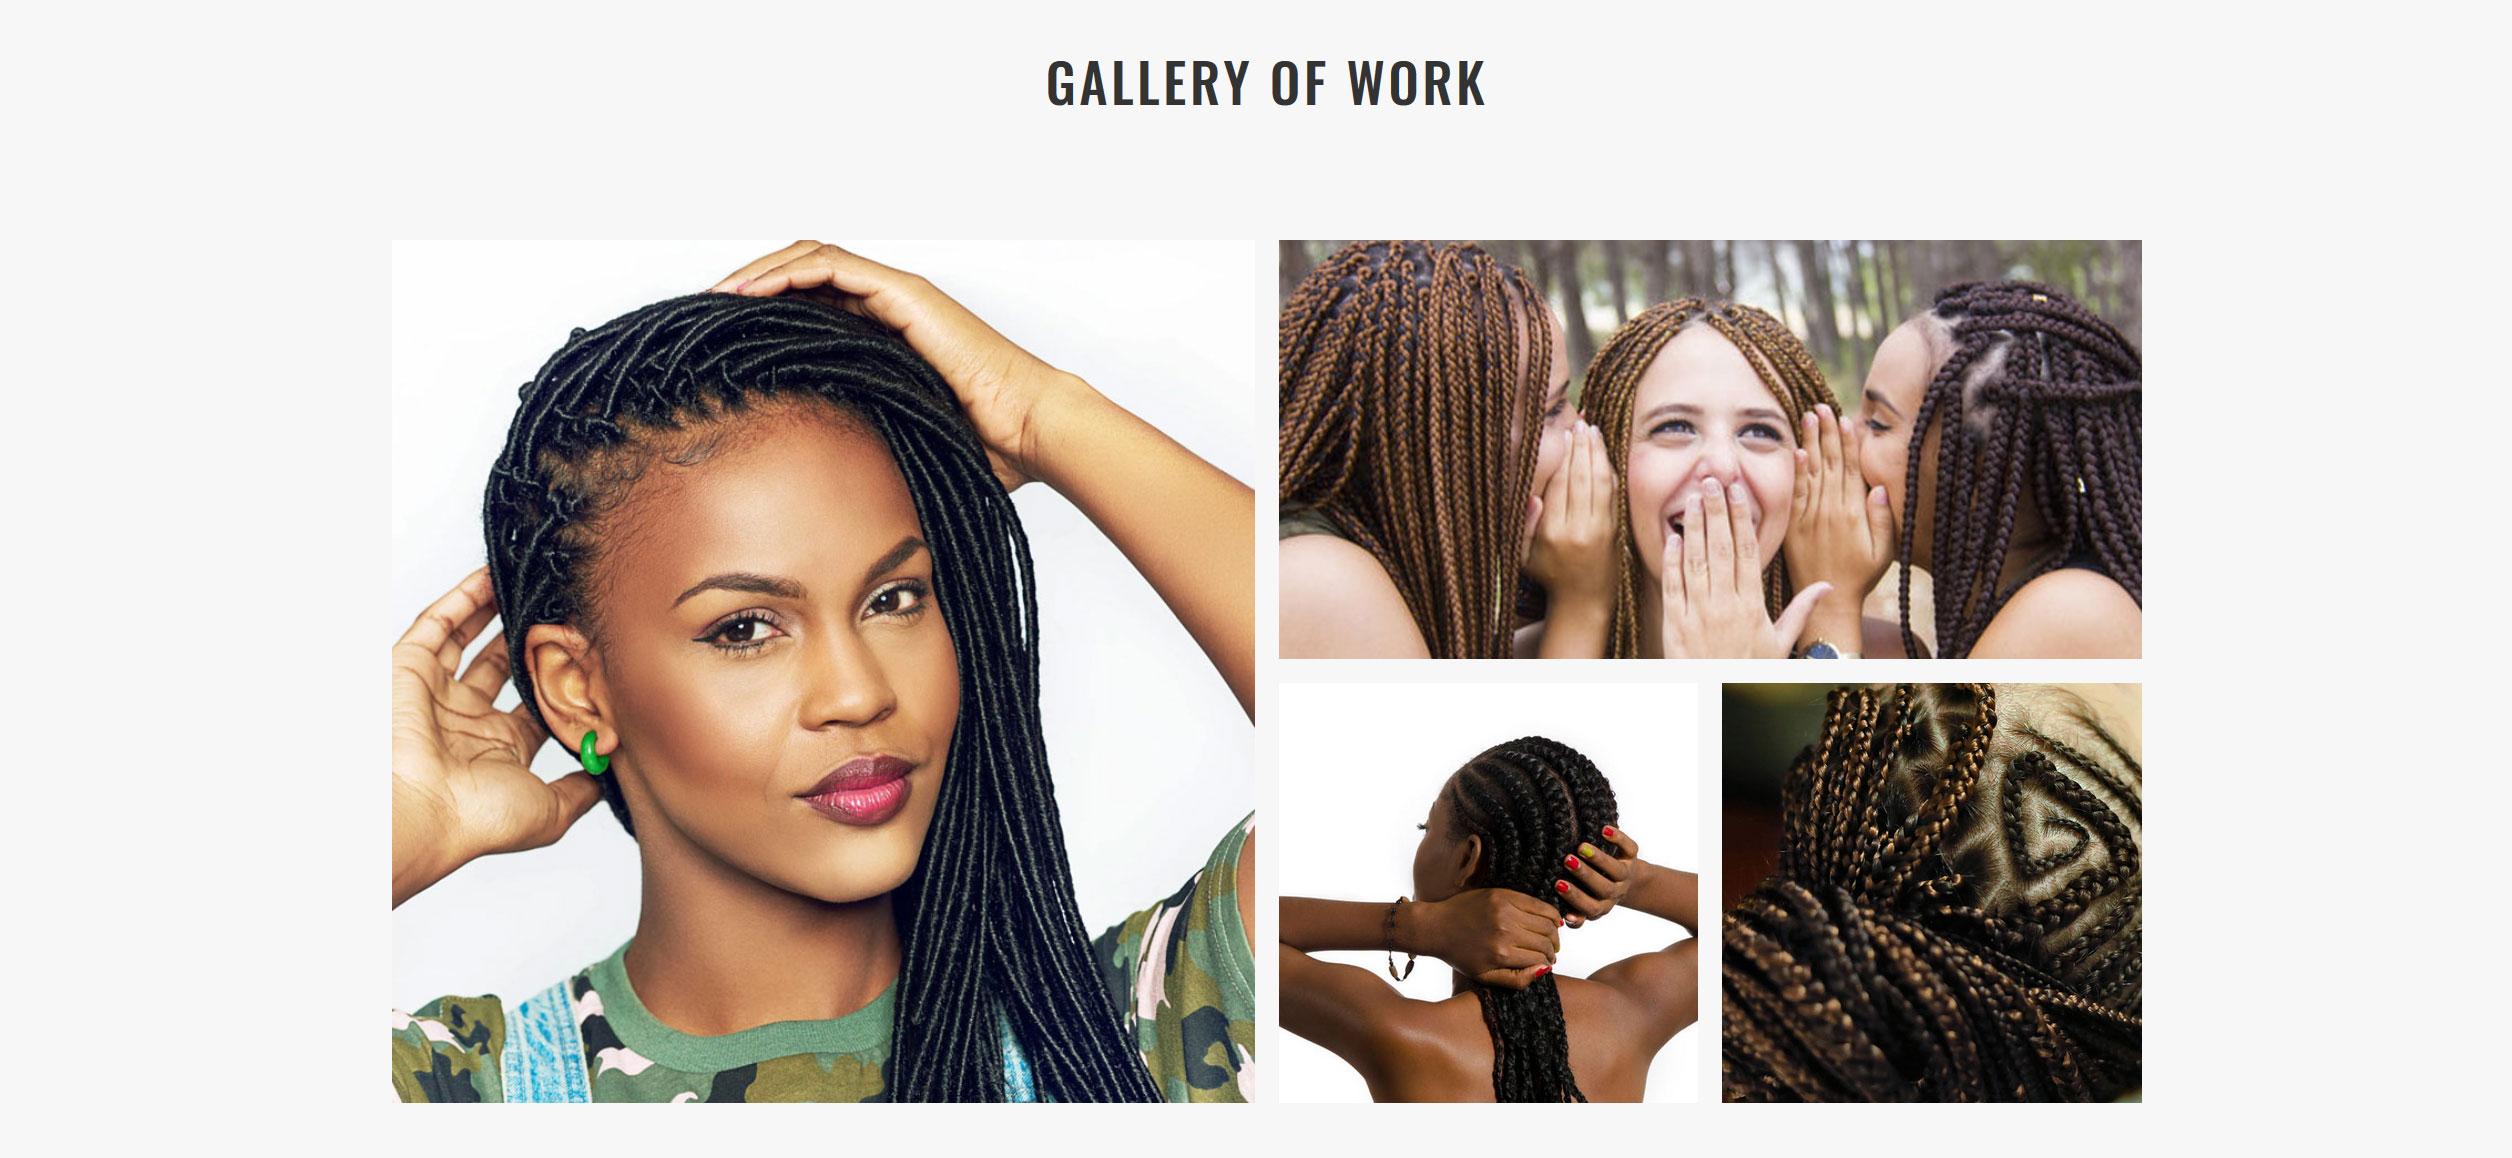 Website for Hair Braiding v1 - Portfolio of Work